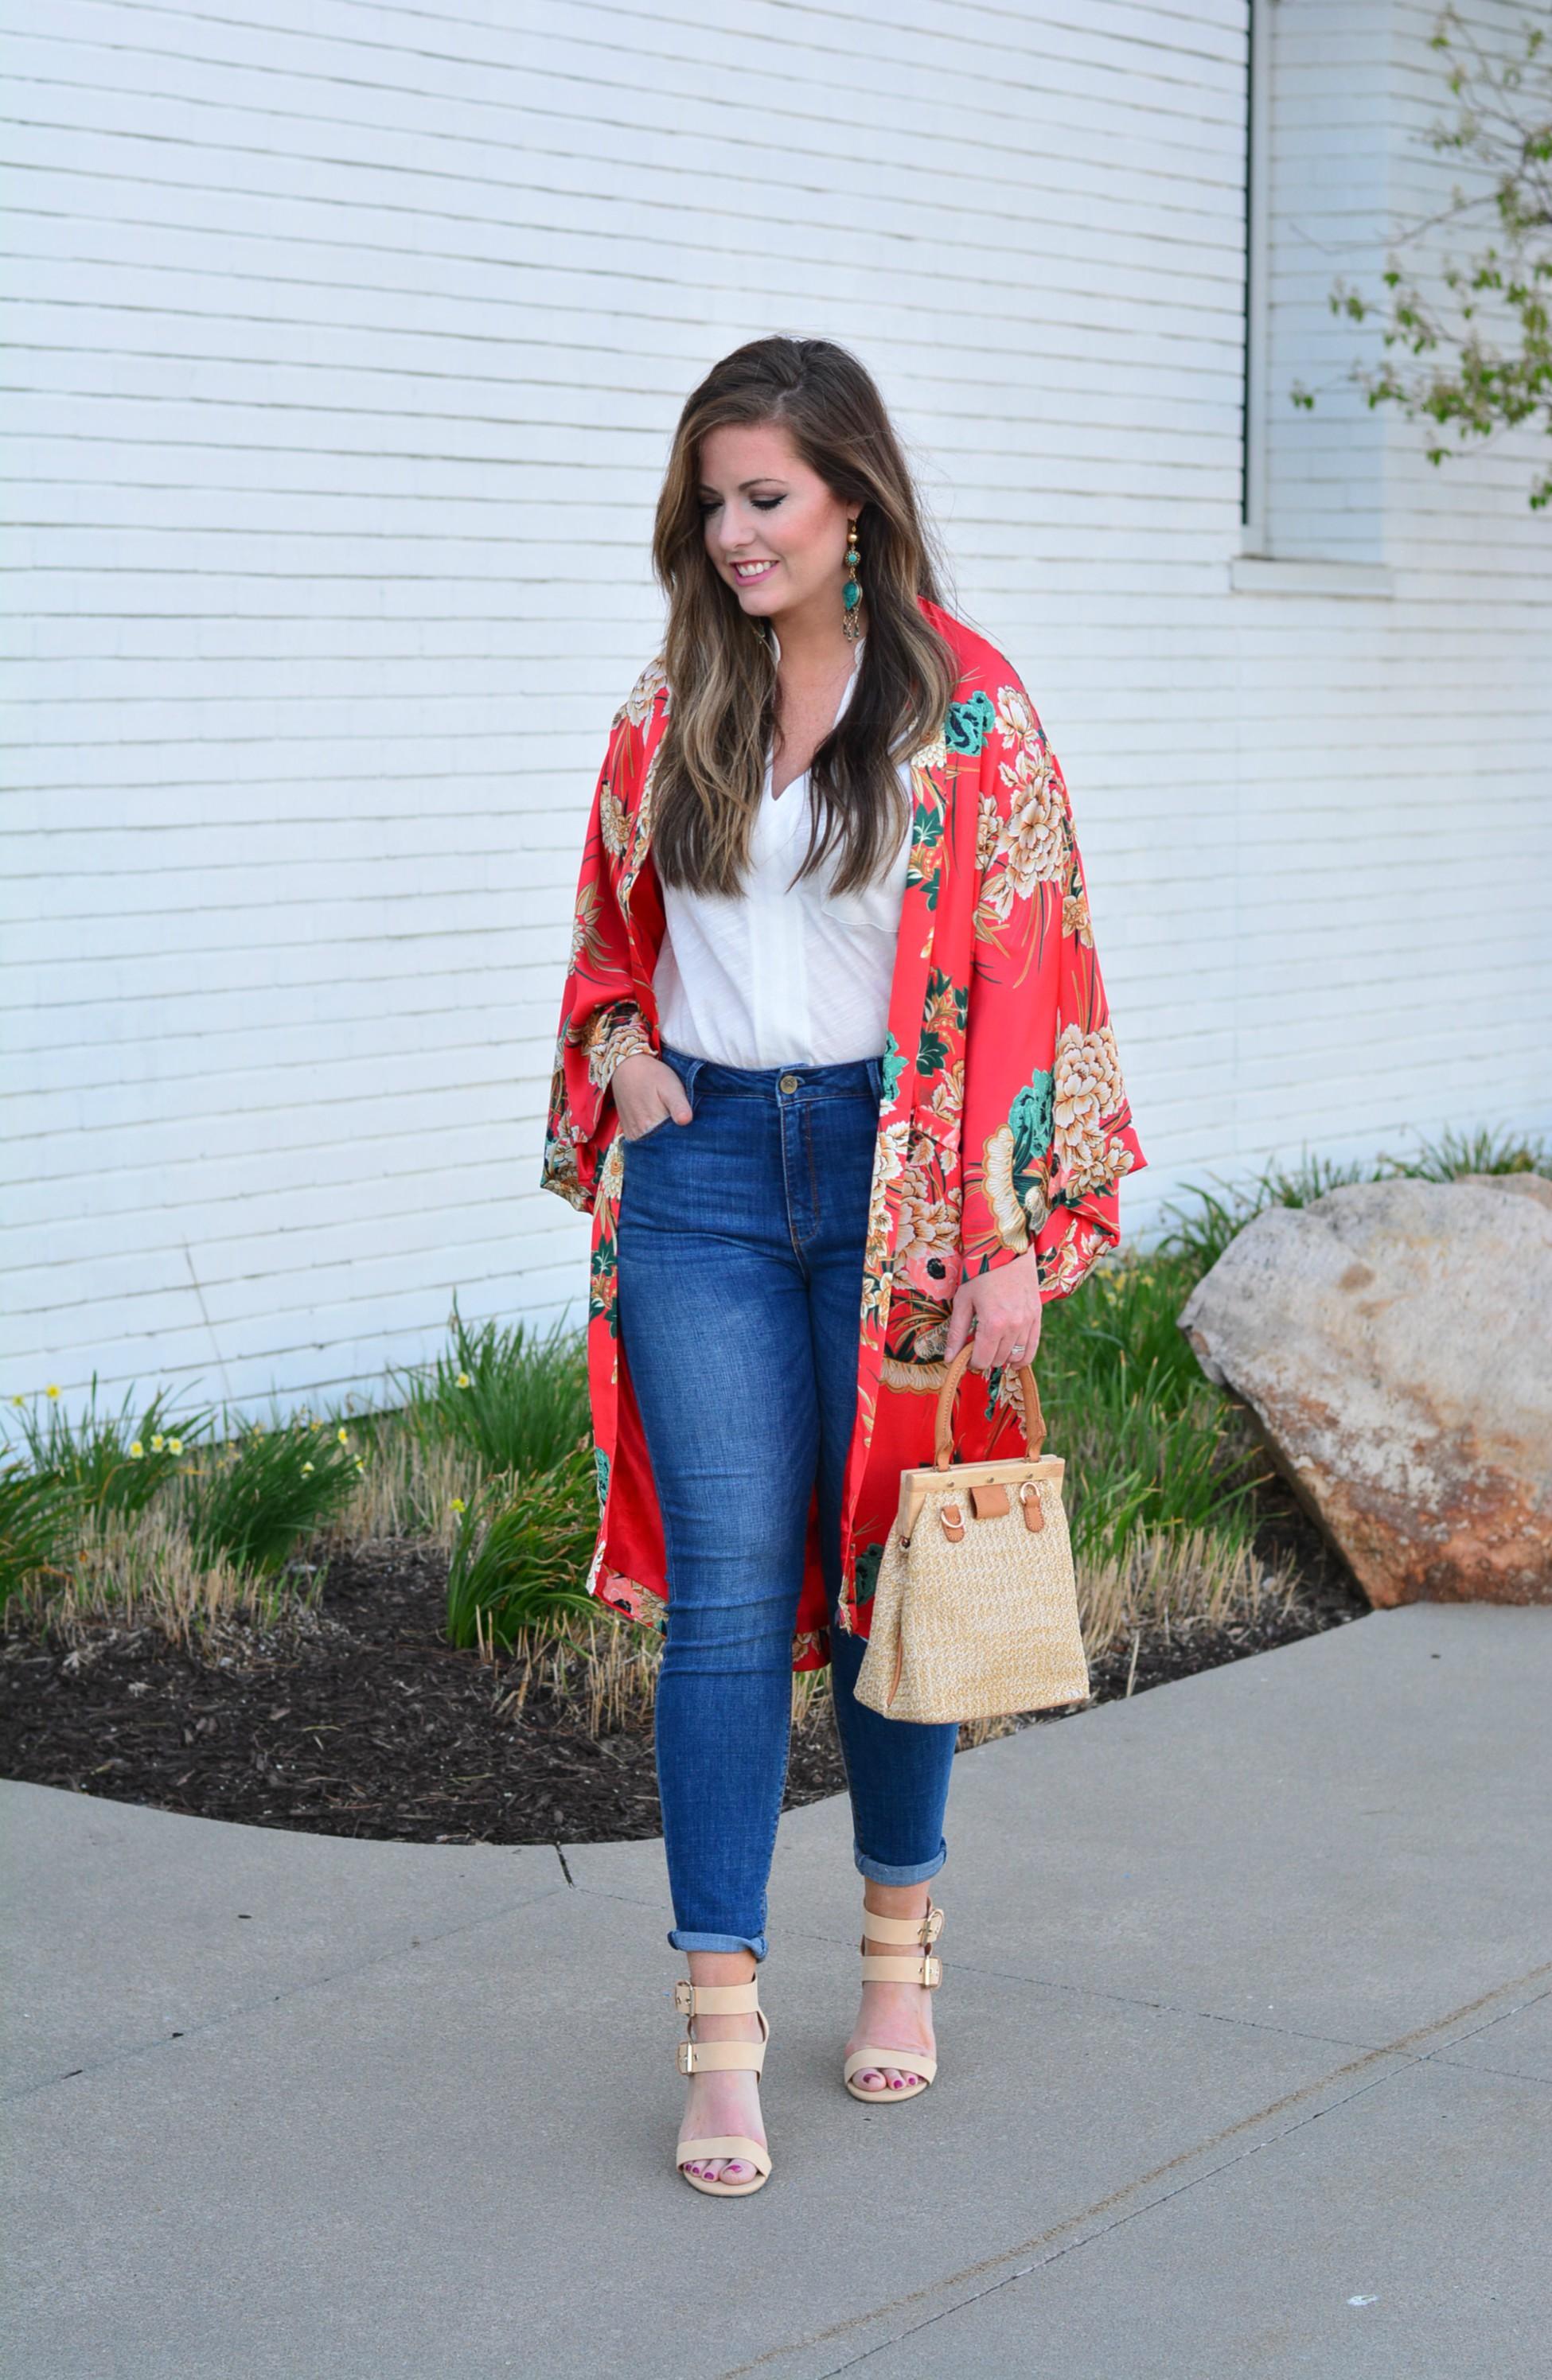 Floral Kimono - Sophisticaited